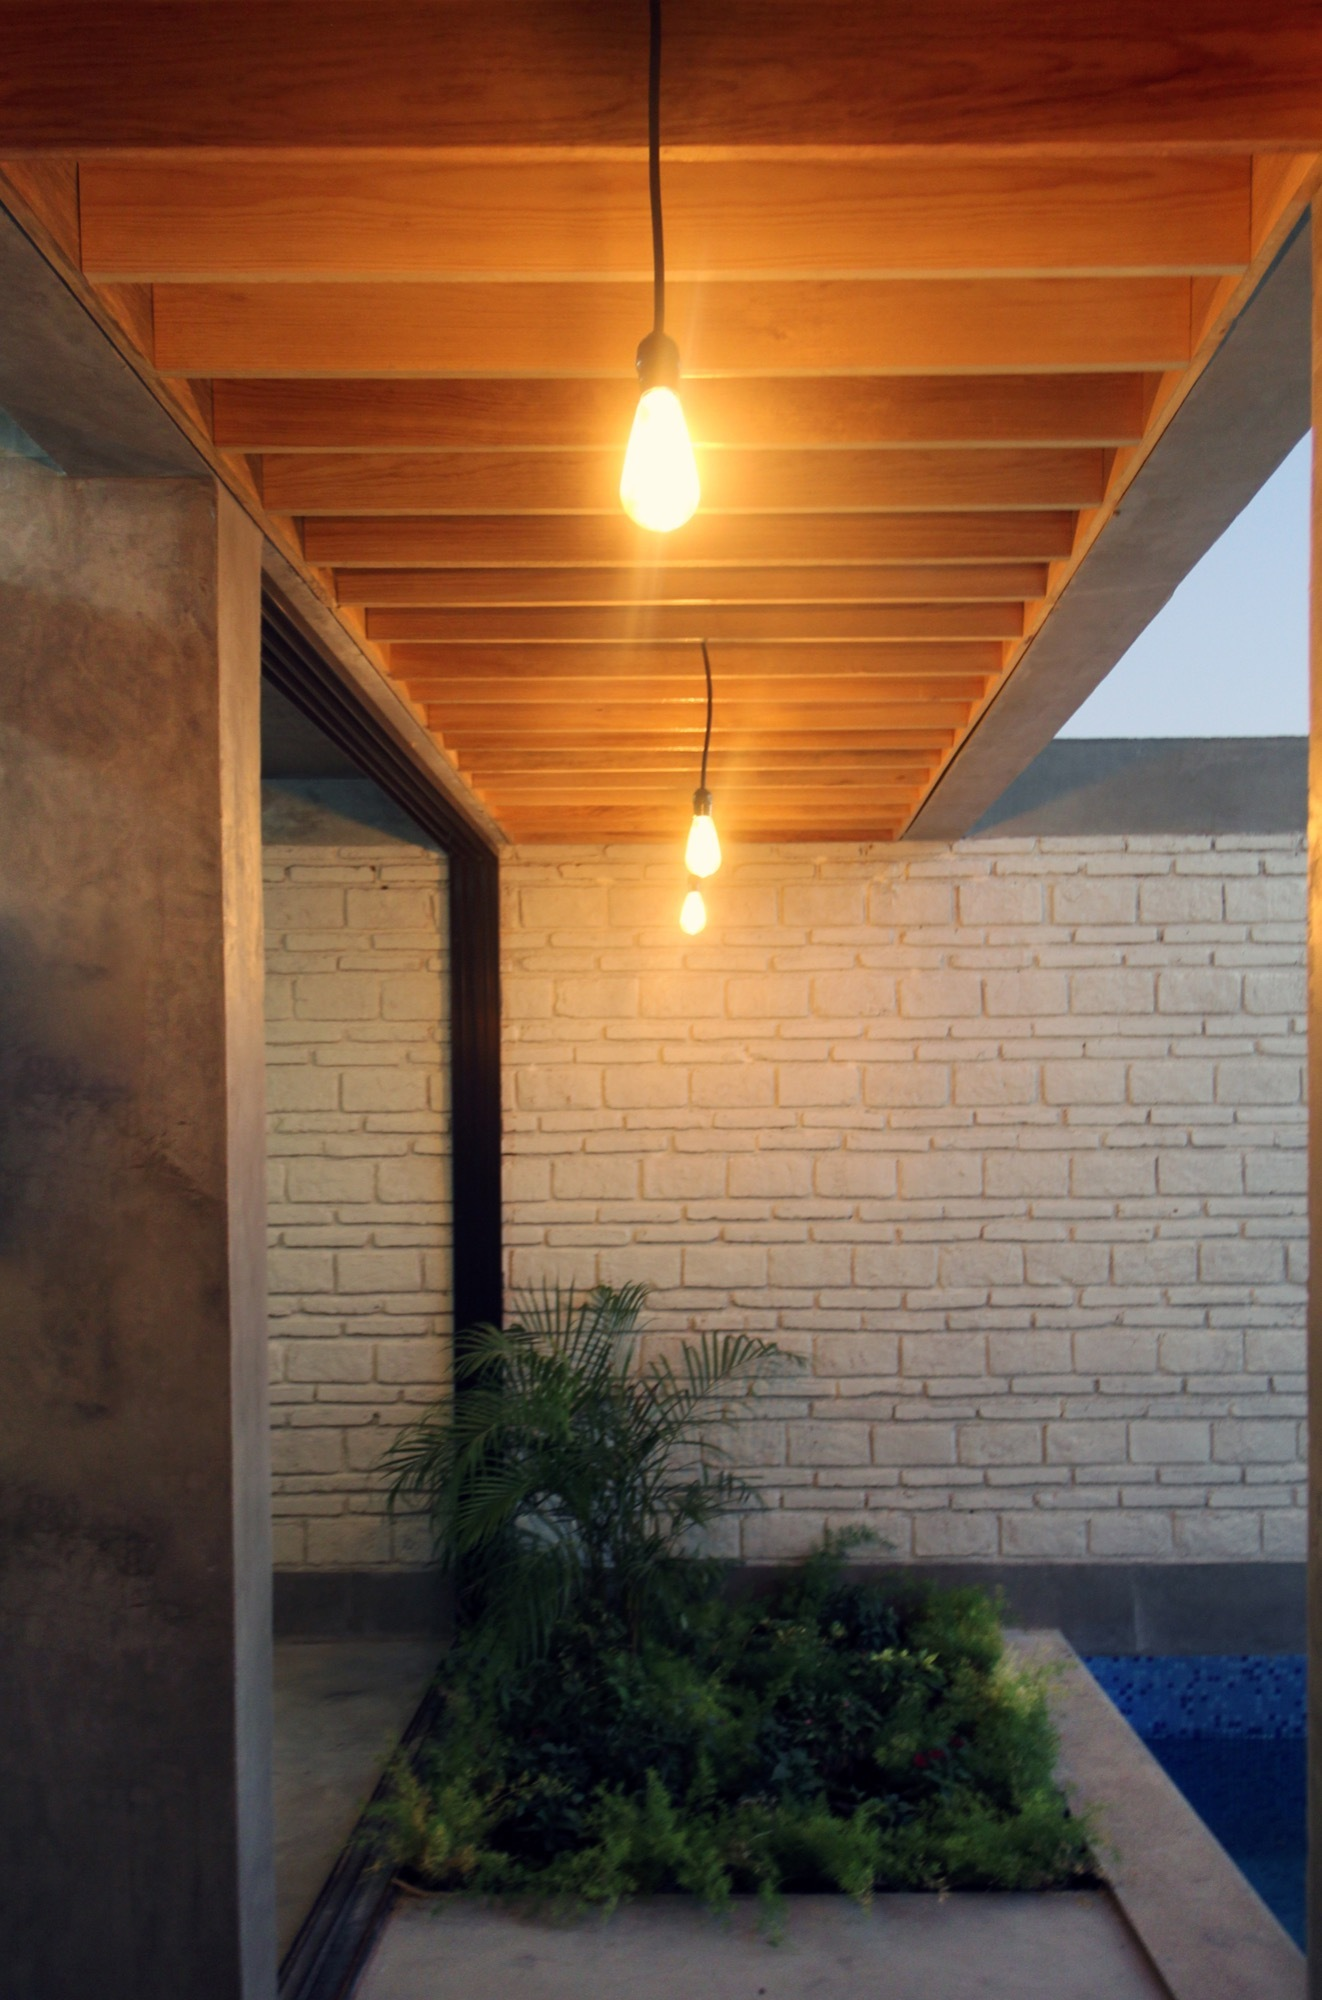 Galer a de casa g la apaloosa estudio de arquitectura y for Estudio de arquitectura